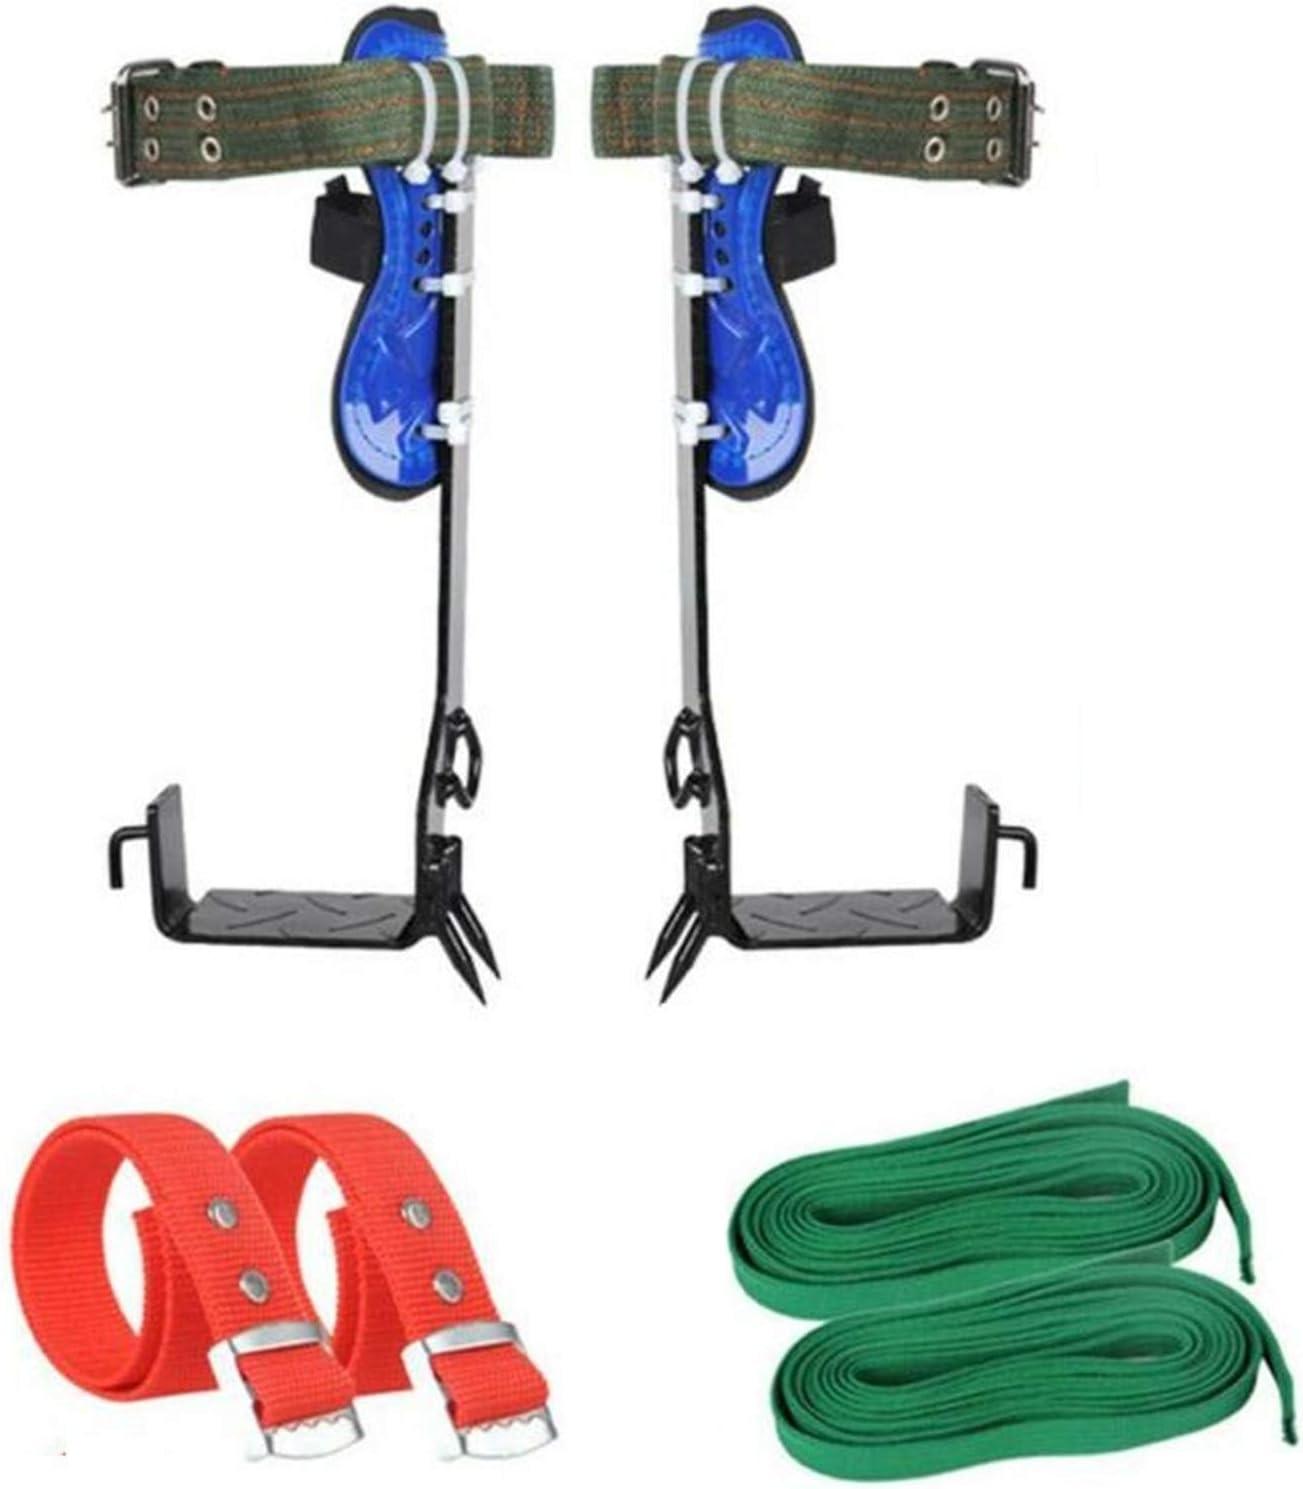 Tberar Tree Climbing Gear Regular dealer 6 Set in One Spike safety